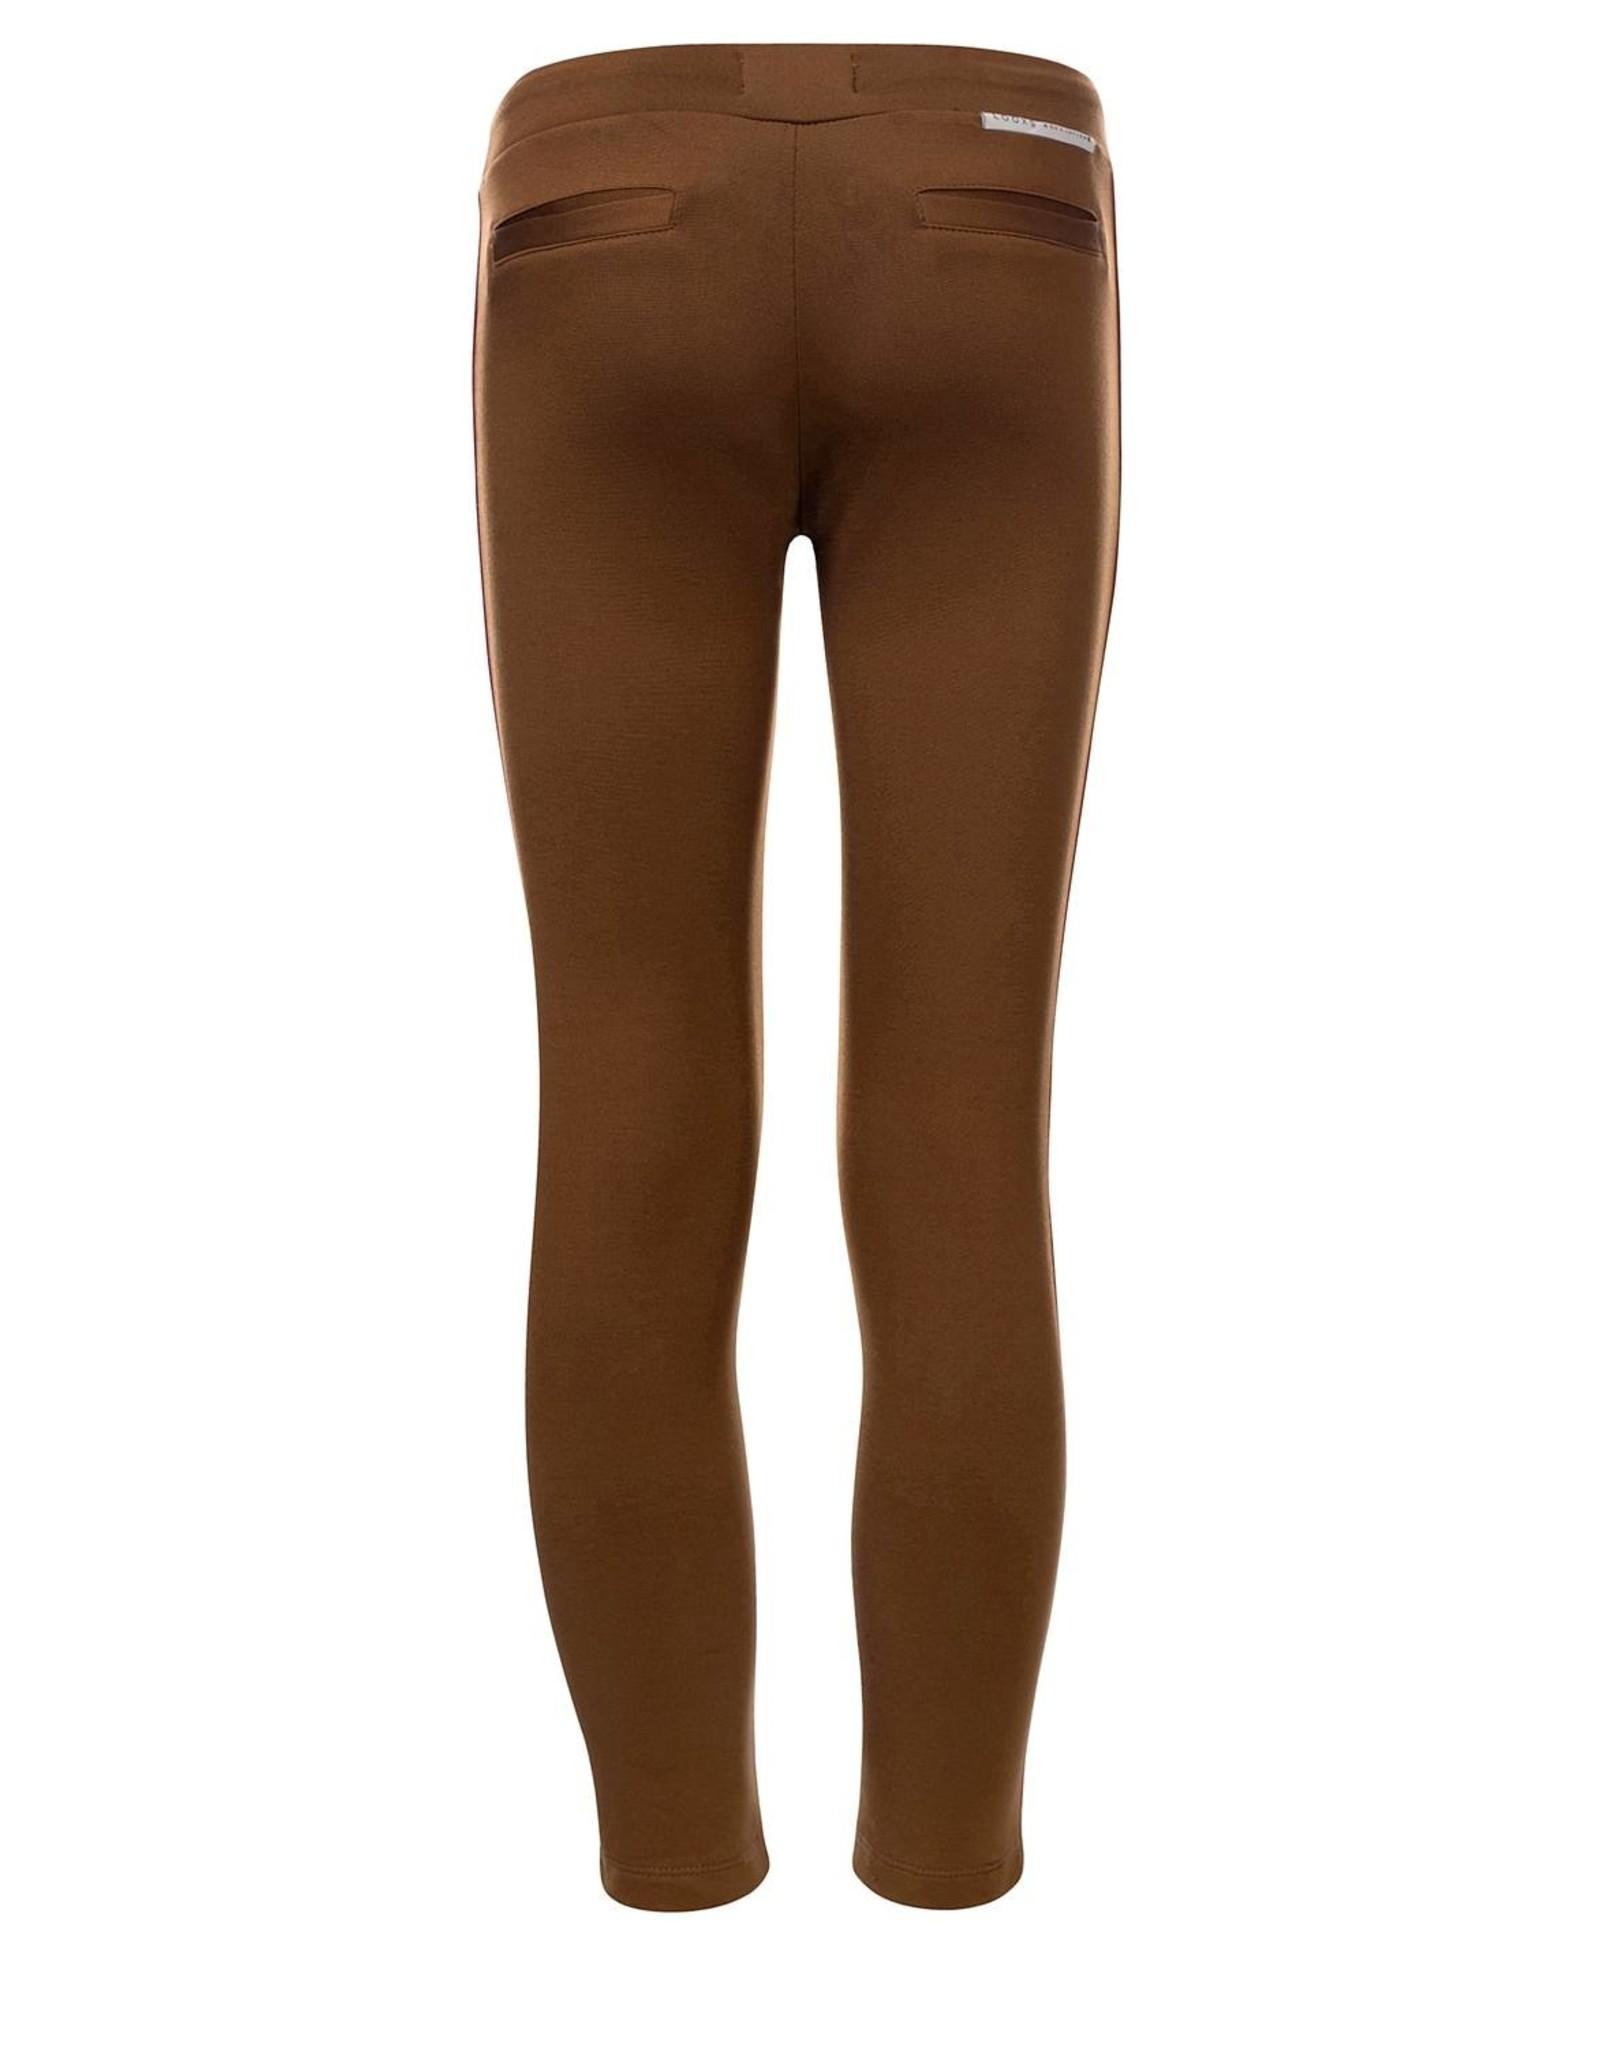 Looxs Revolution Girls sporty sweat pants